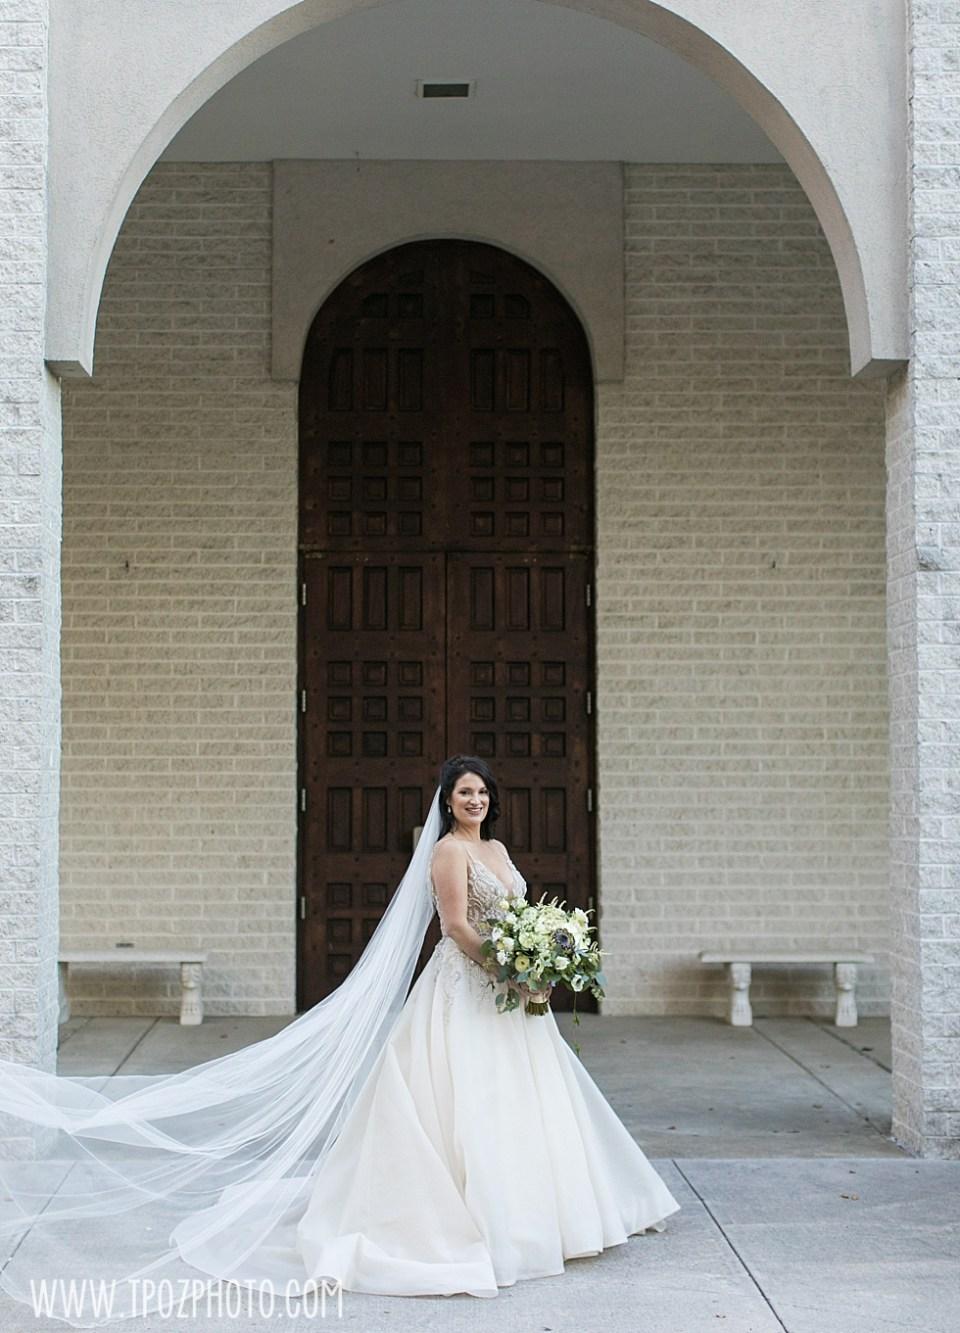 Beautiful bride at her St. Demetrios Greek Orthodox Church wedding  •tPoz Photography  •www.tpozphoto.com